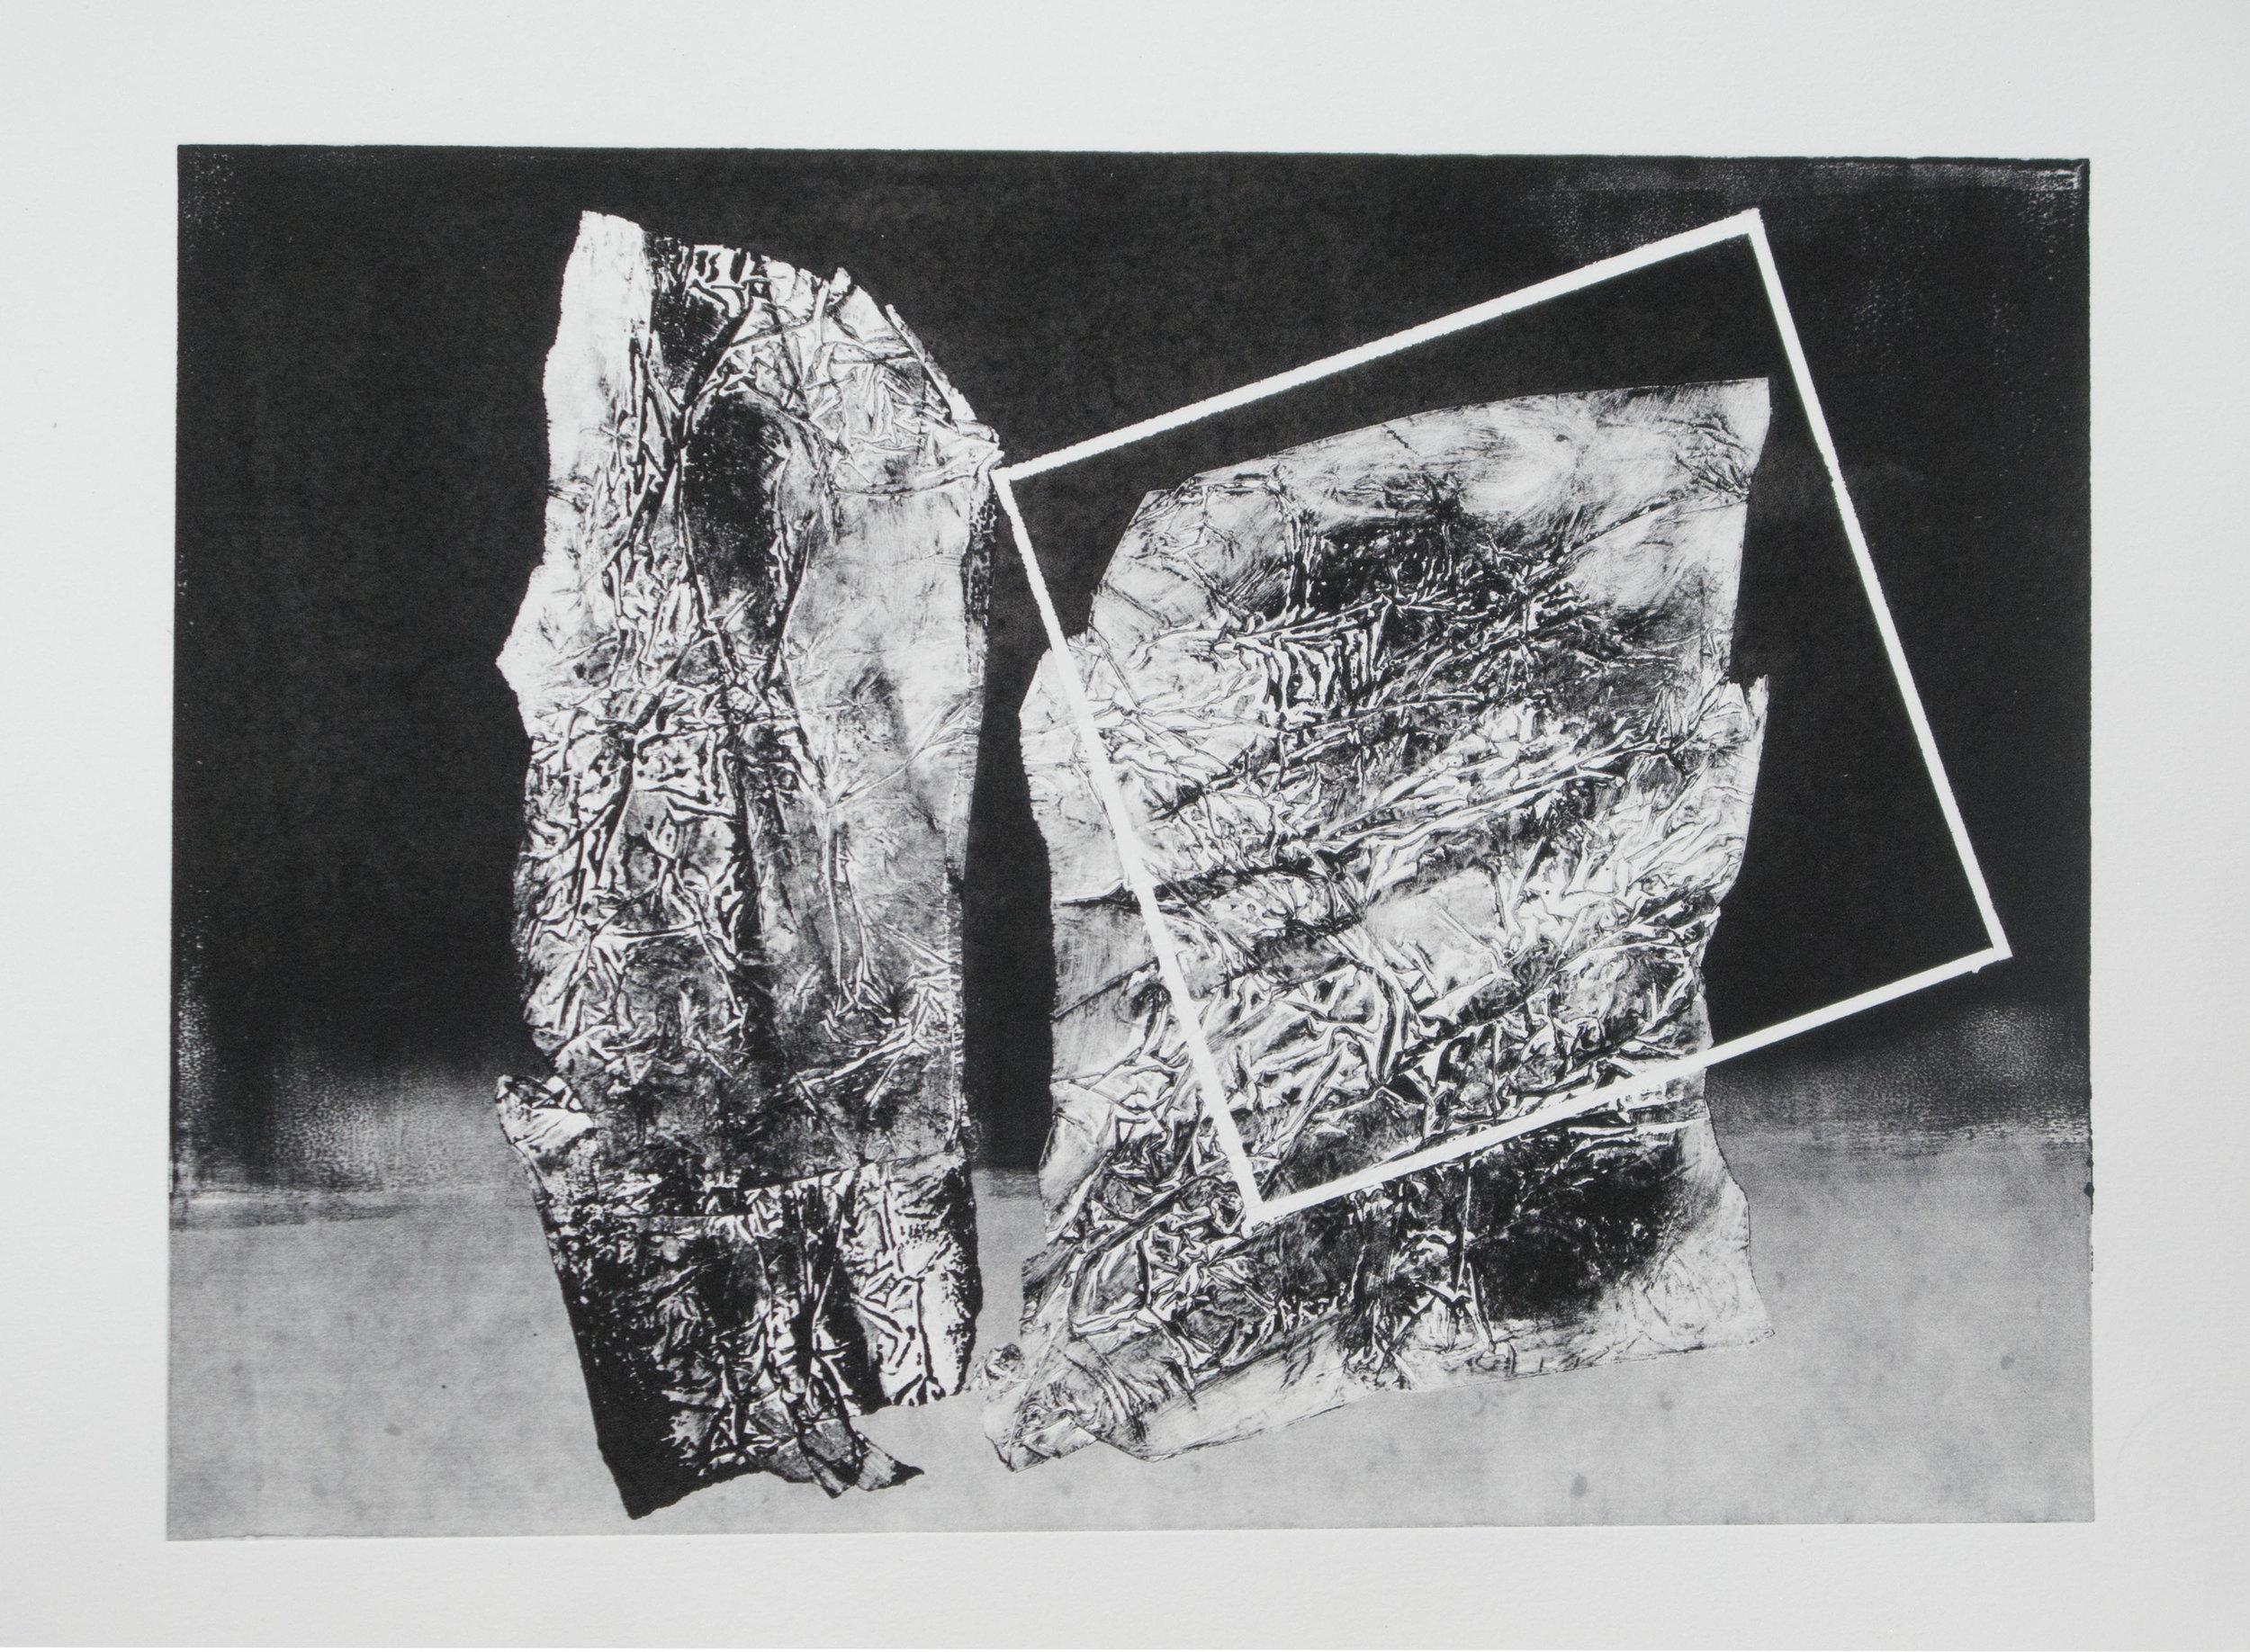 Forms on black 18 (32cm x 26 cm)